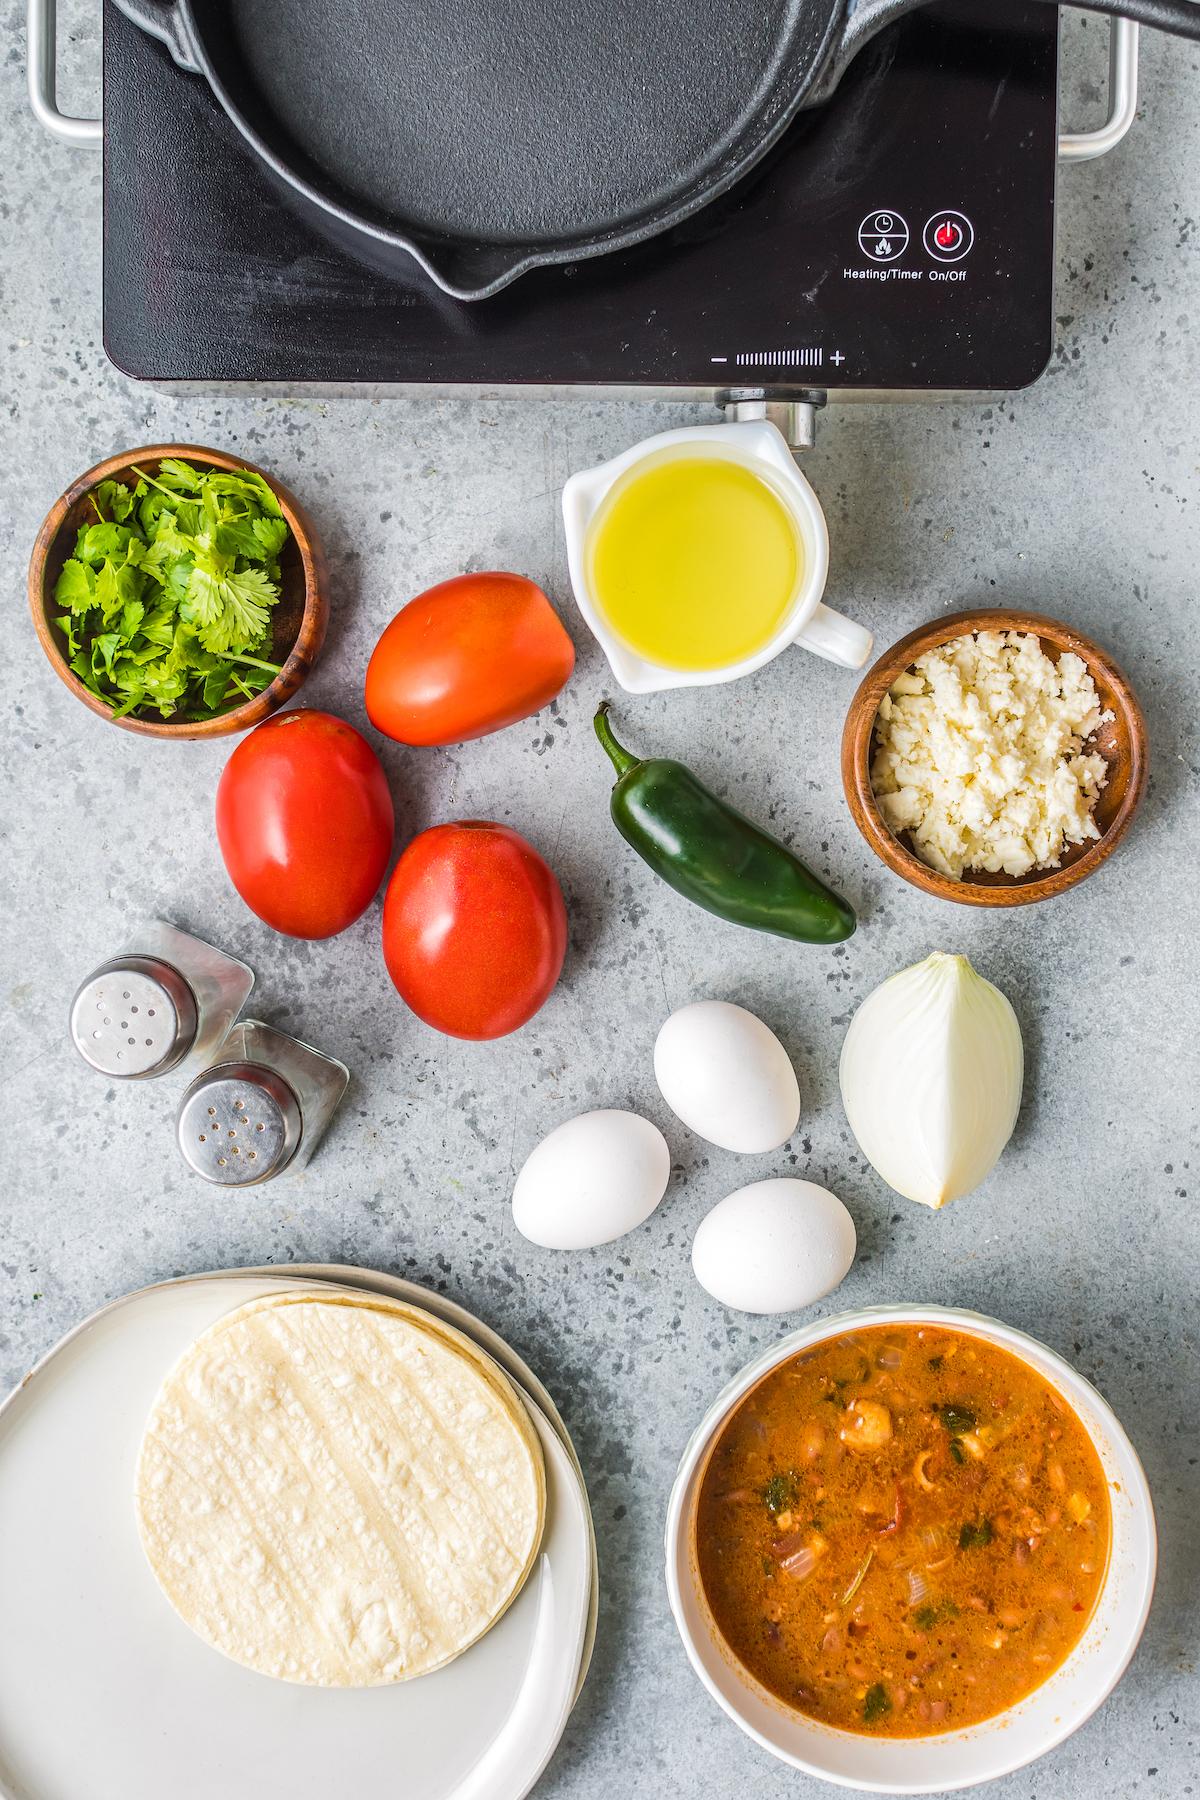 Ingredients for huevos rancheros.